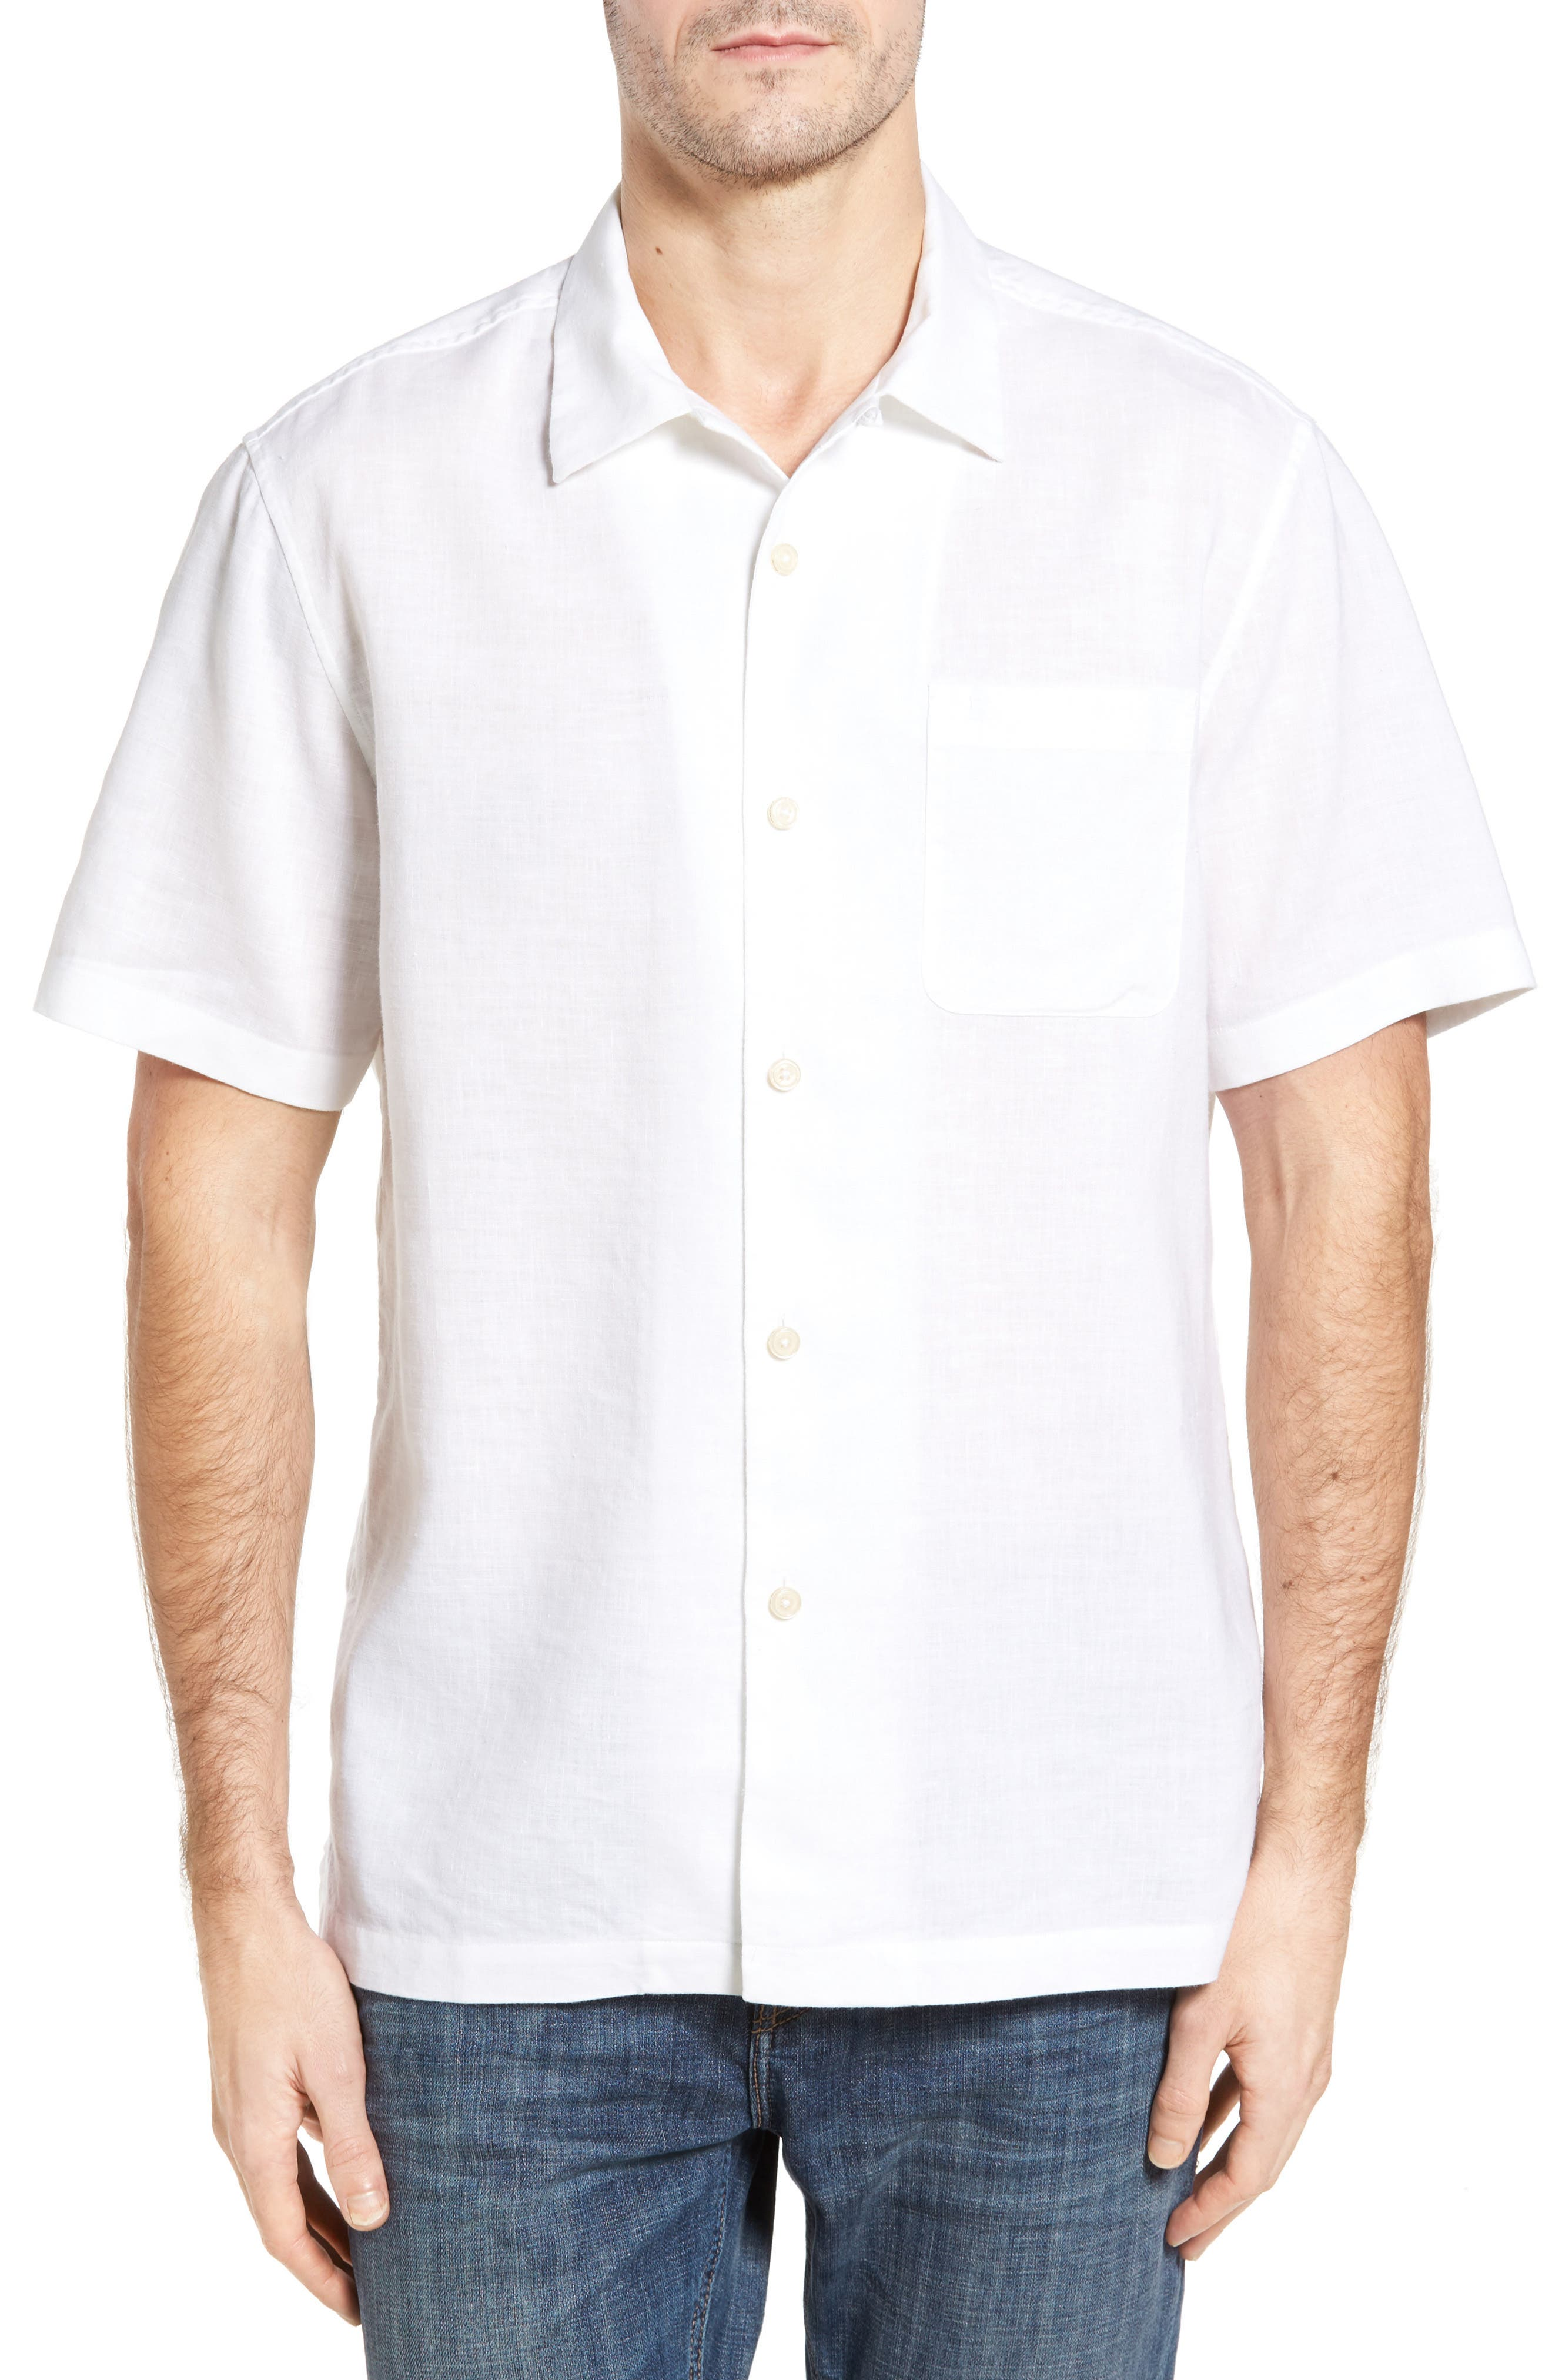 TOMMY BAHAMA Monaco Tides Linen Blend Camp Shirt